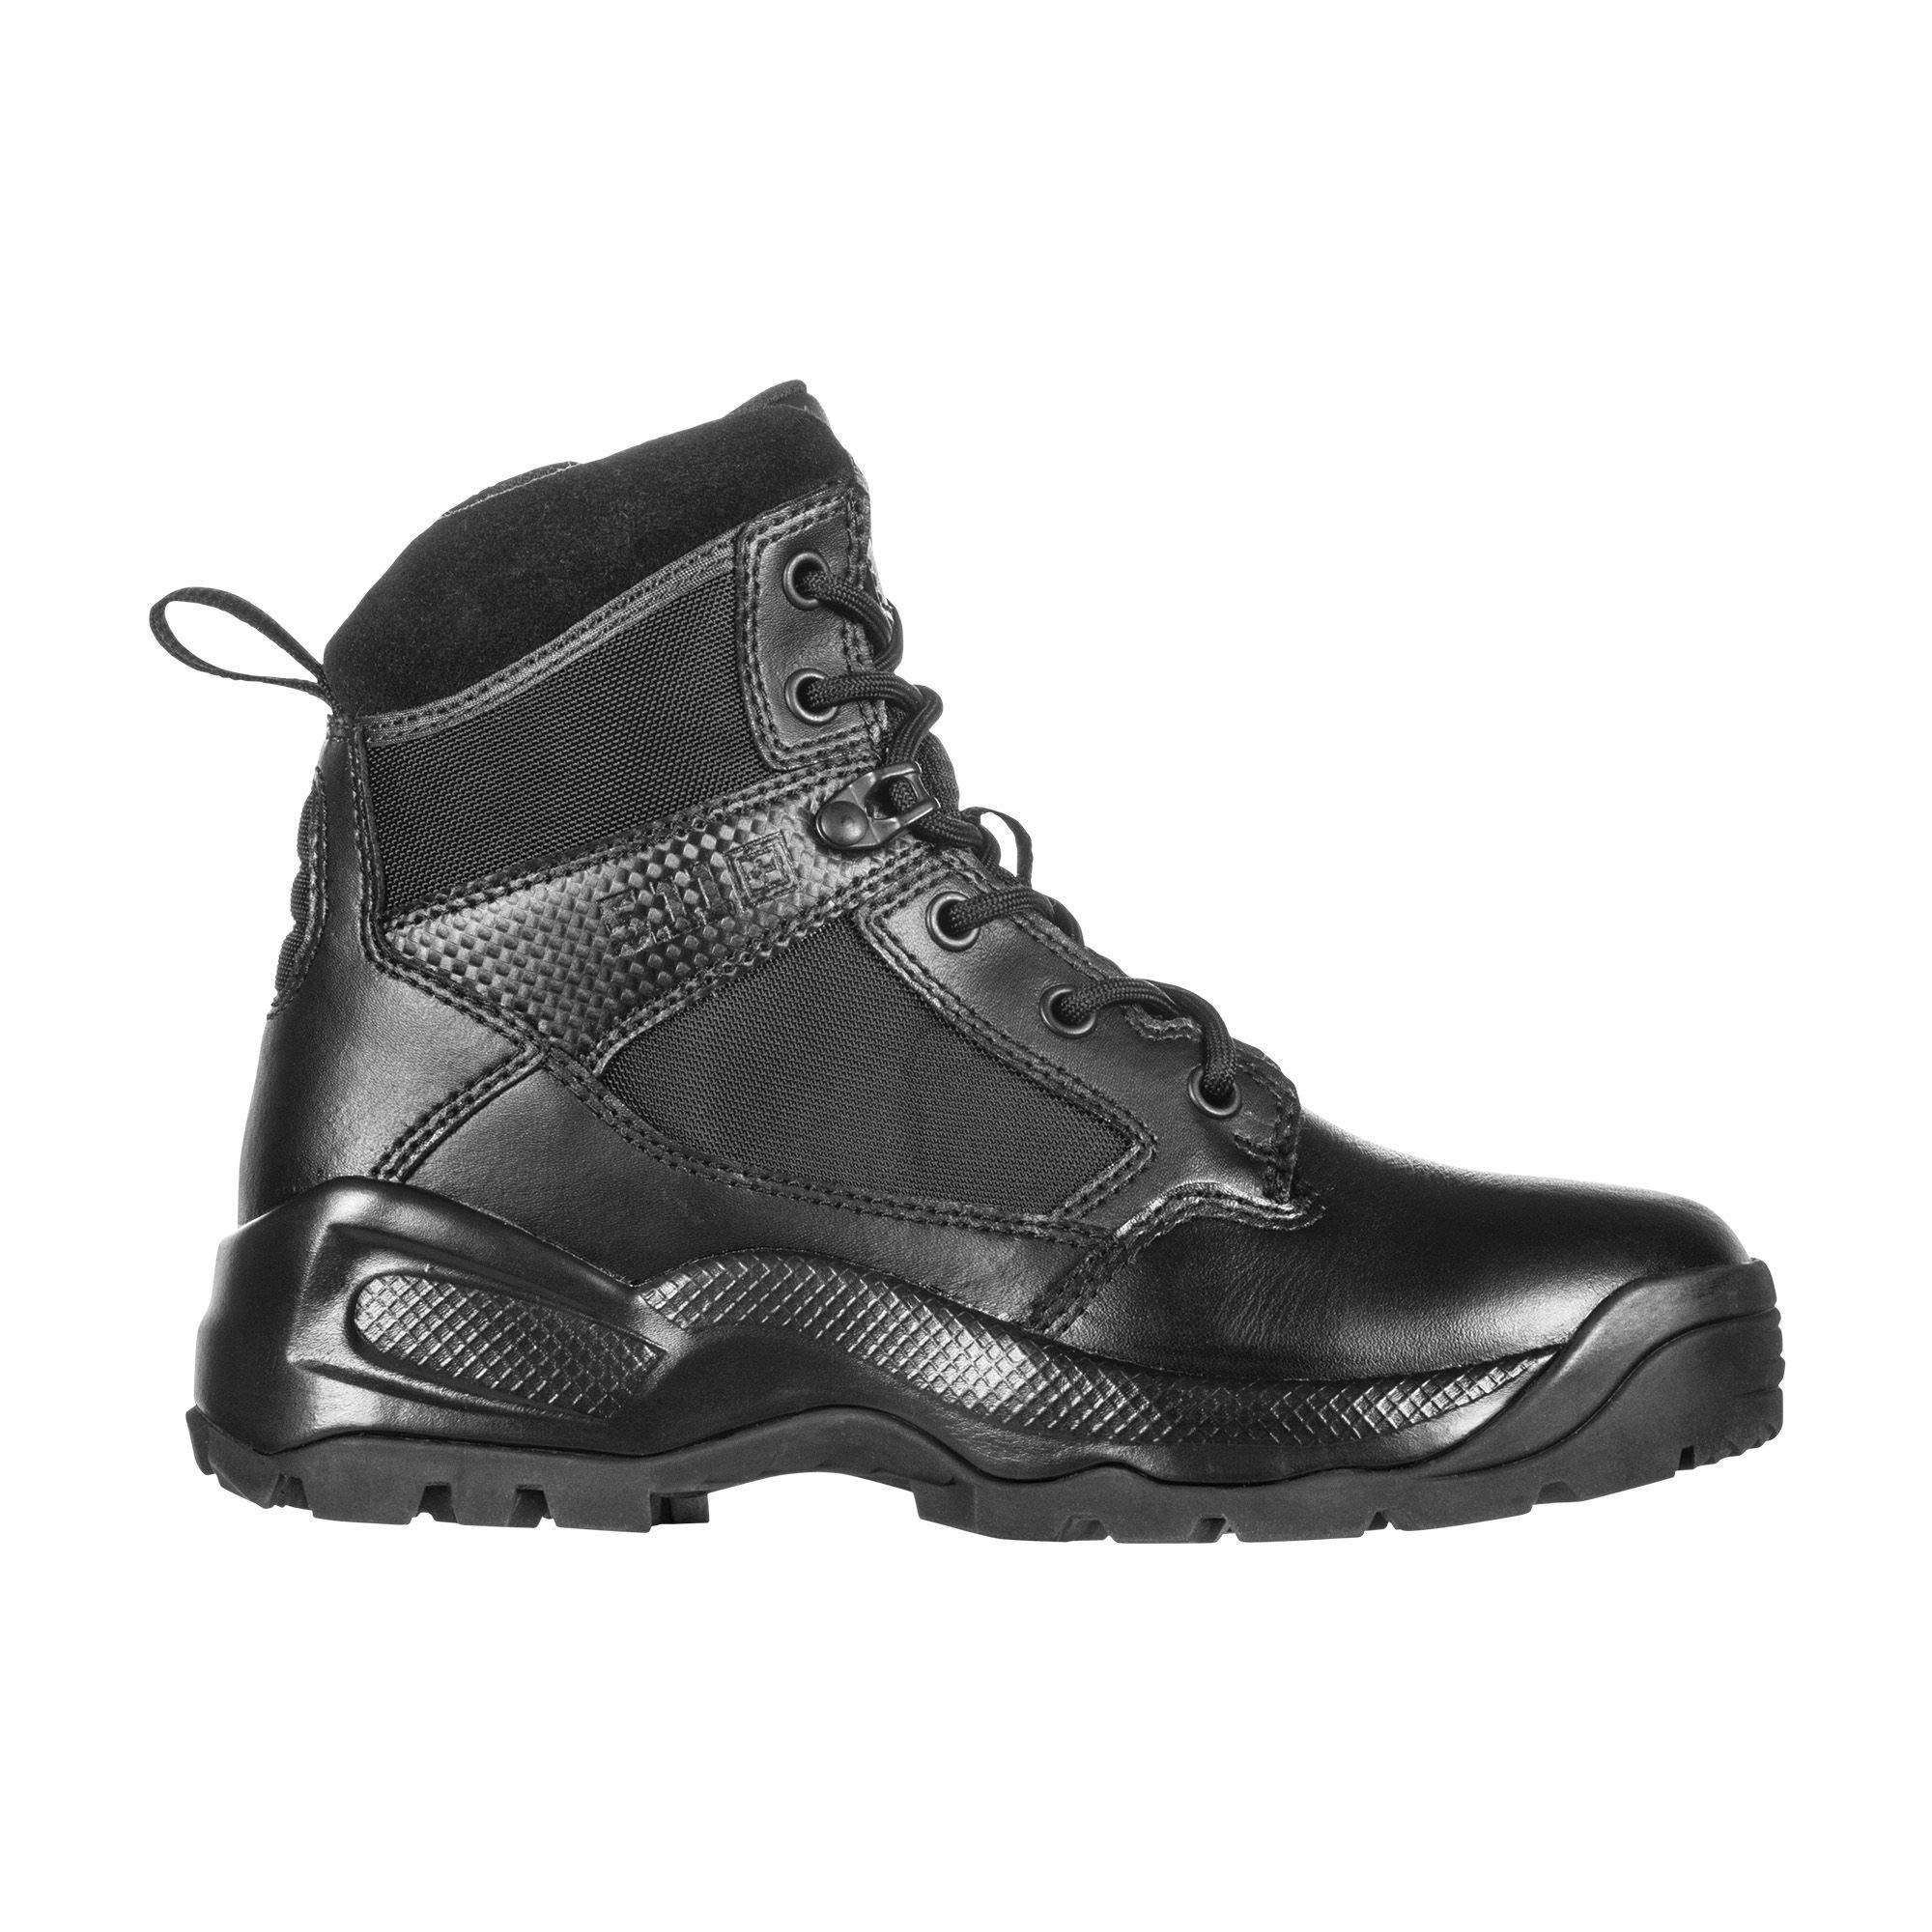 5.11 Women's ATAC 2.0 6'' Tactical Side Zip Military Combat Boot, Style 12404, Black, 9.5 D(M) US